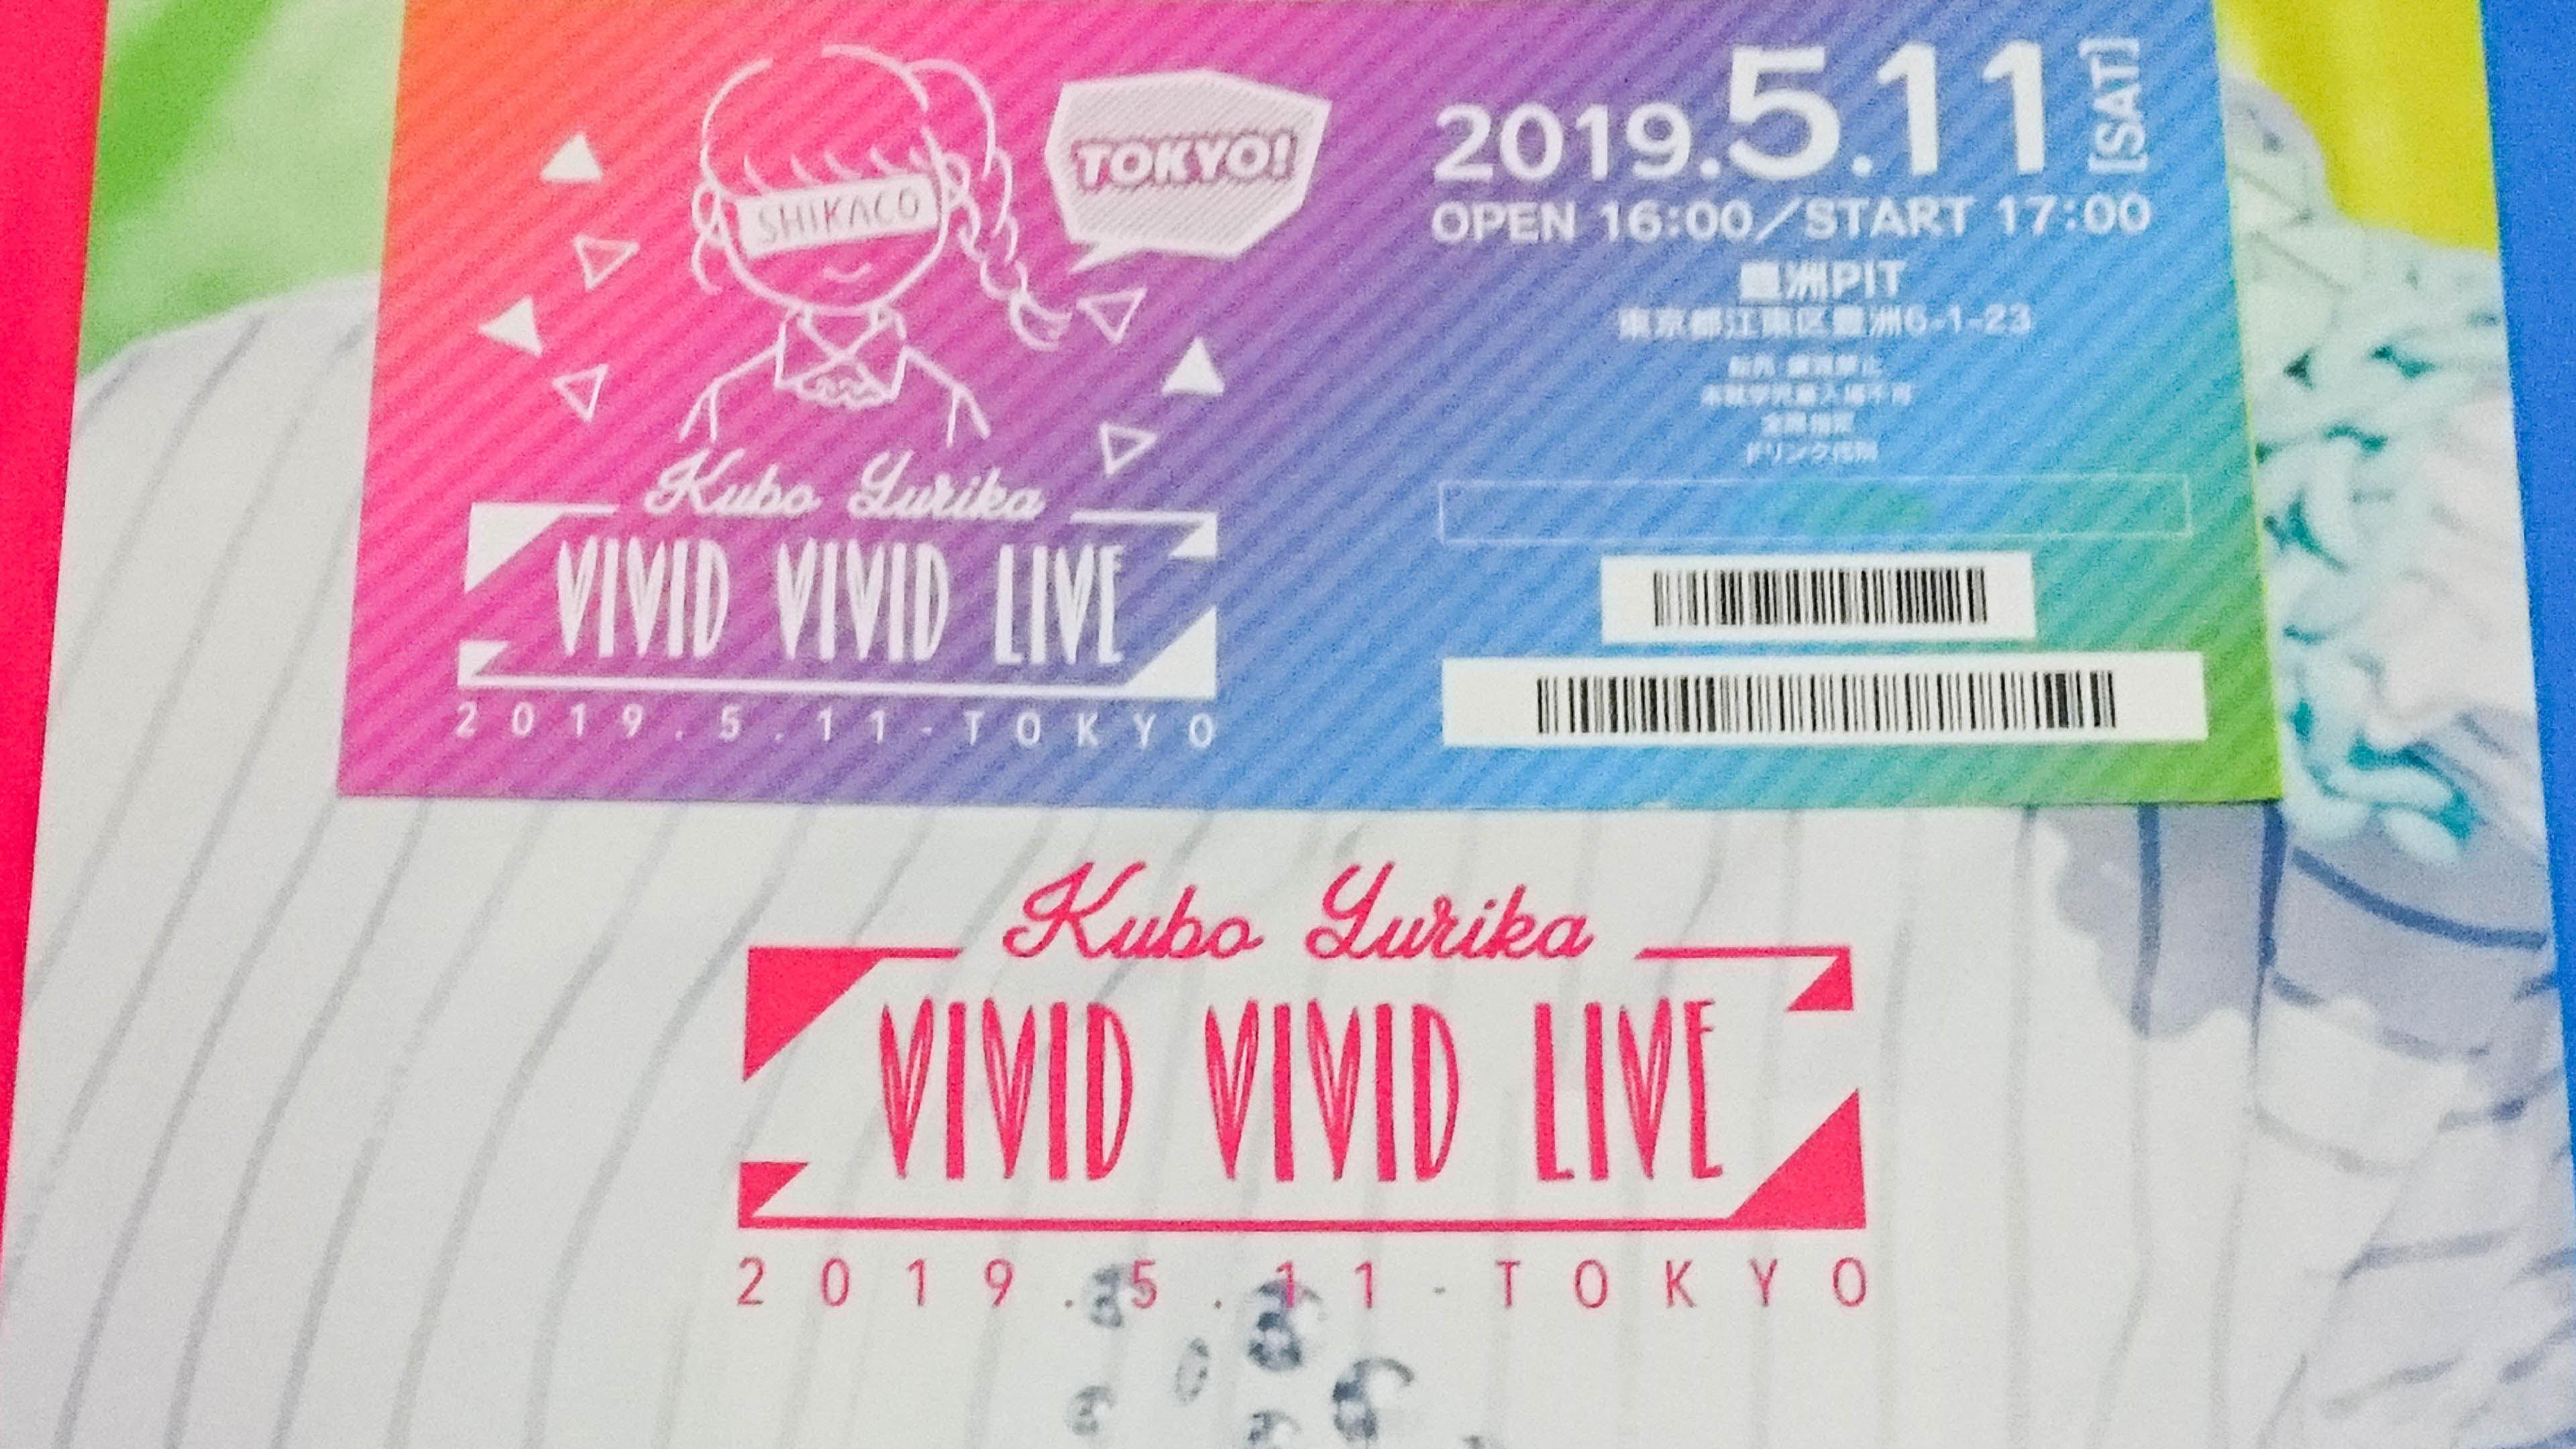 KUBO YURIKA VIVID VIVID LIVE@豊洲PIT シカちゃんの2年ぶりのライブに行った話